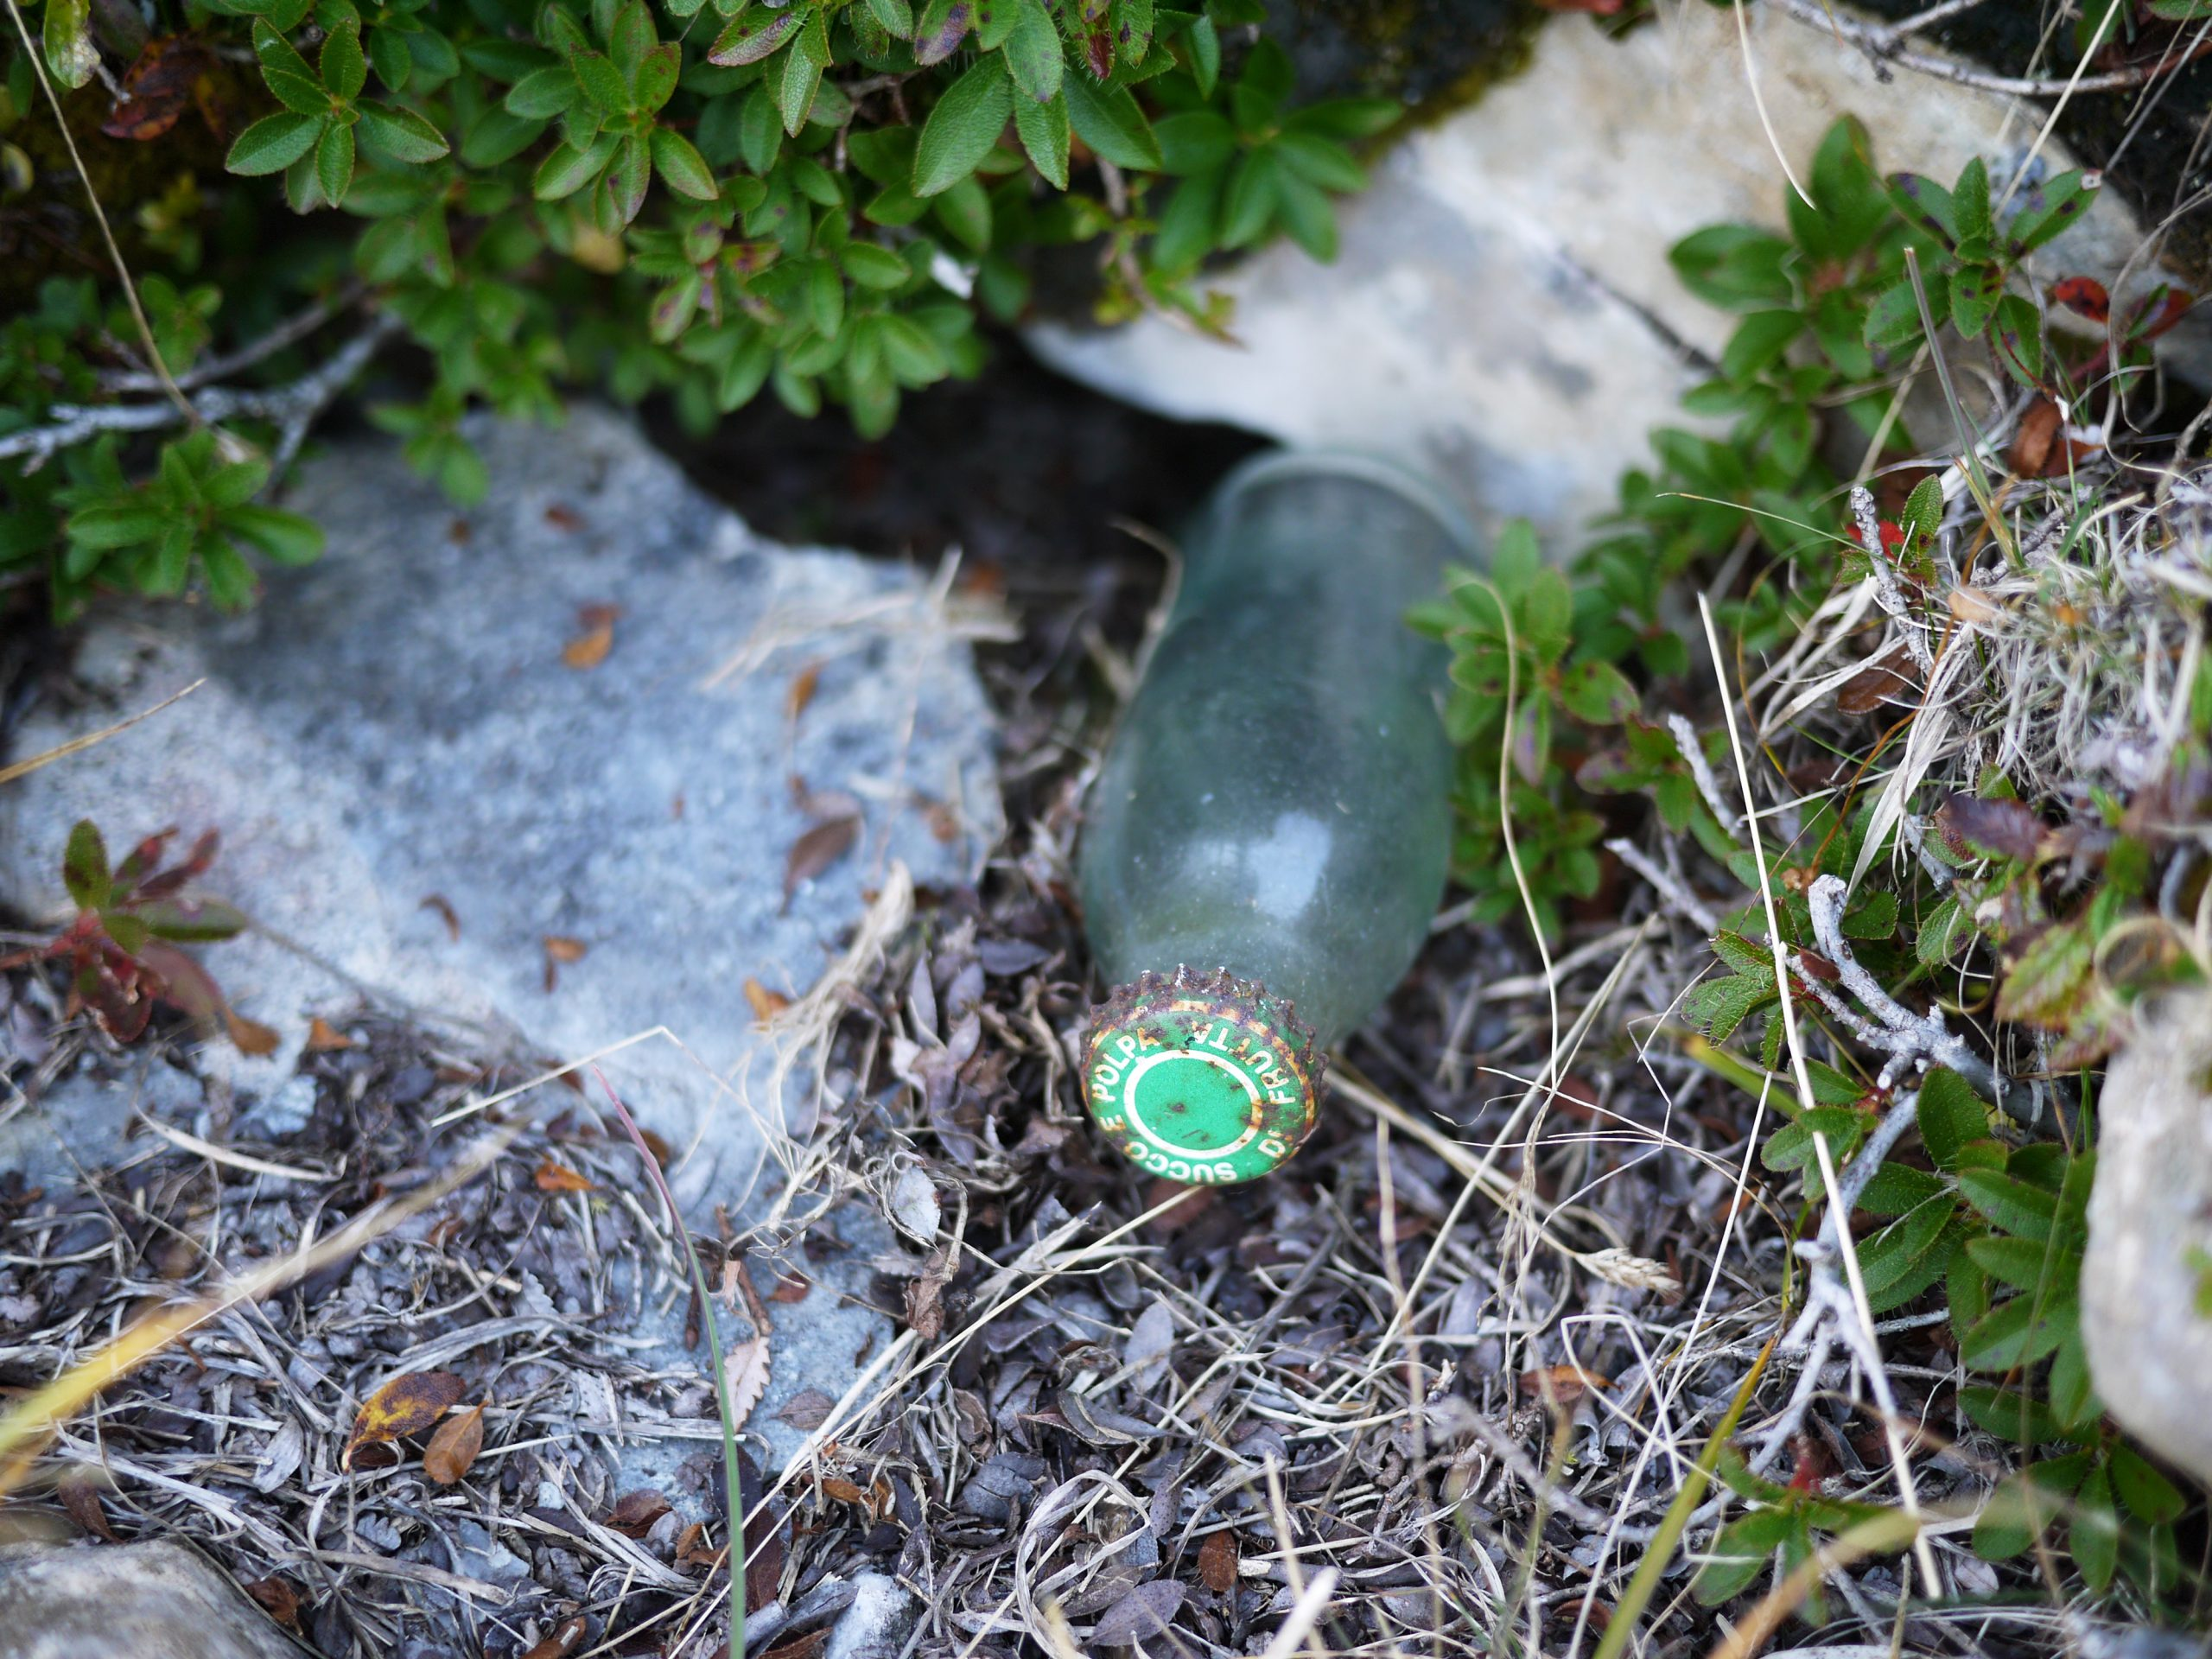 Müll am Berg